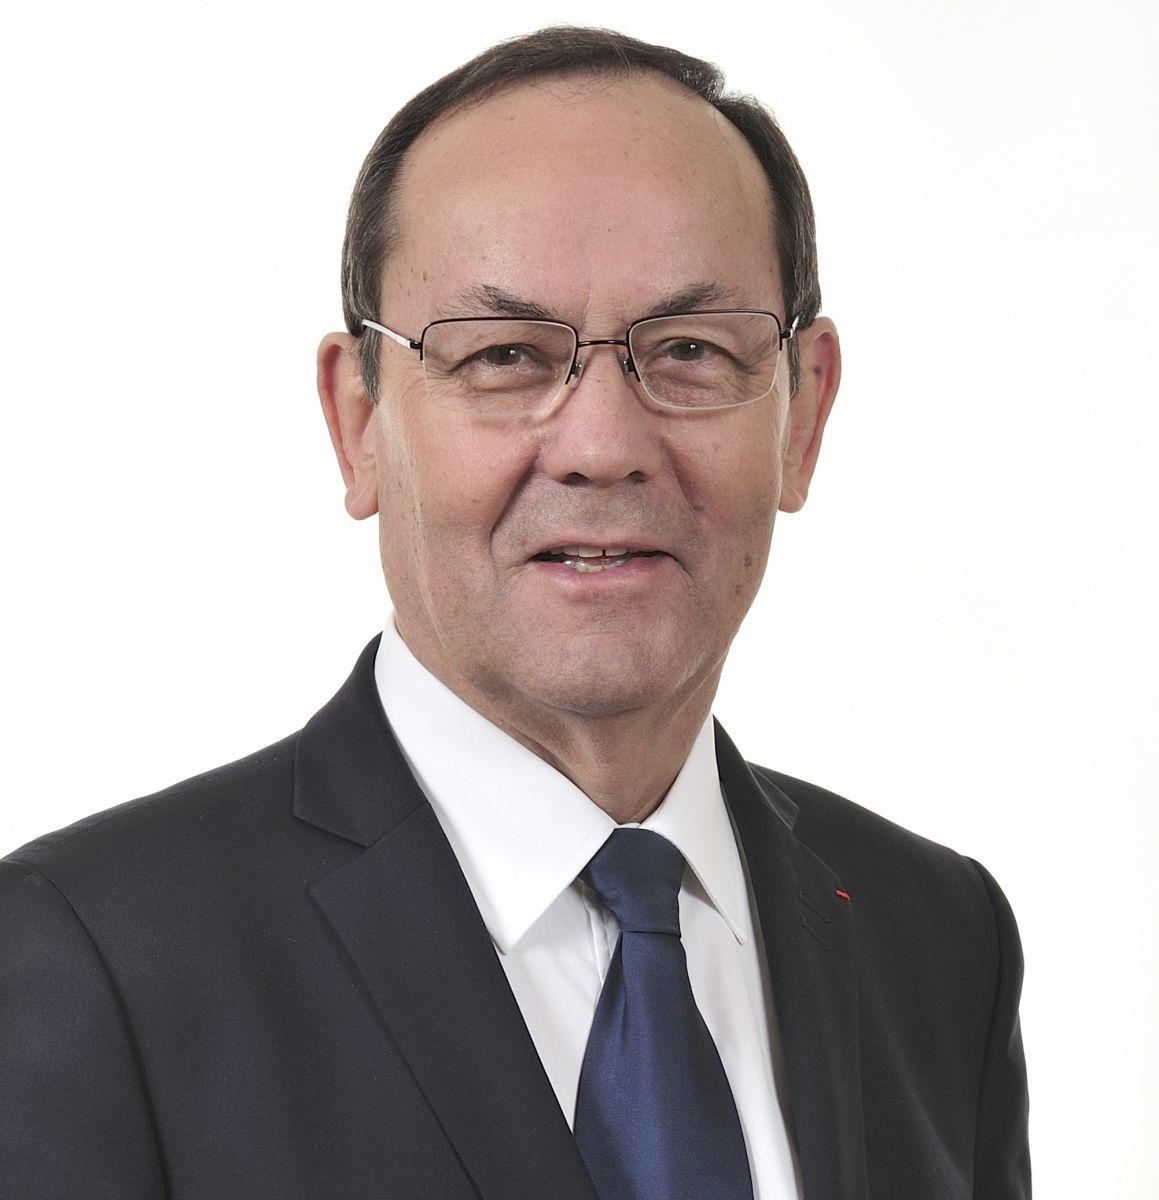 https://prostars.fr/wp-content/uploads/2019/02/Christian-GILLET_Président_Département_49.jpg